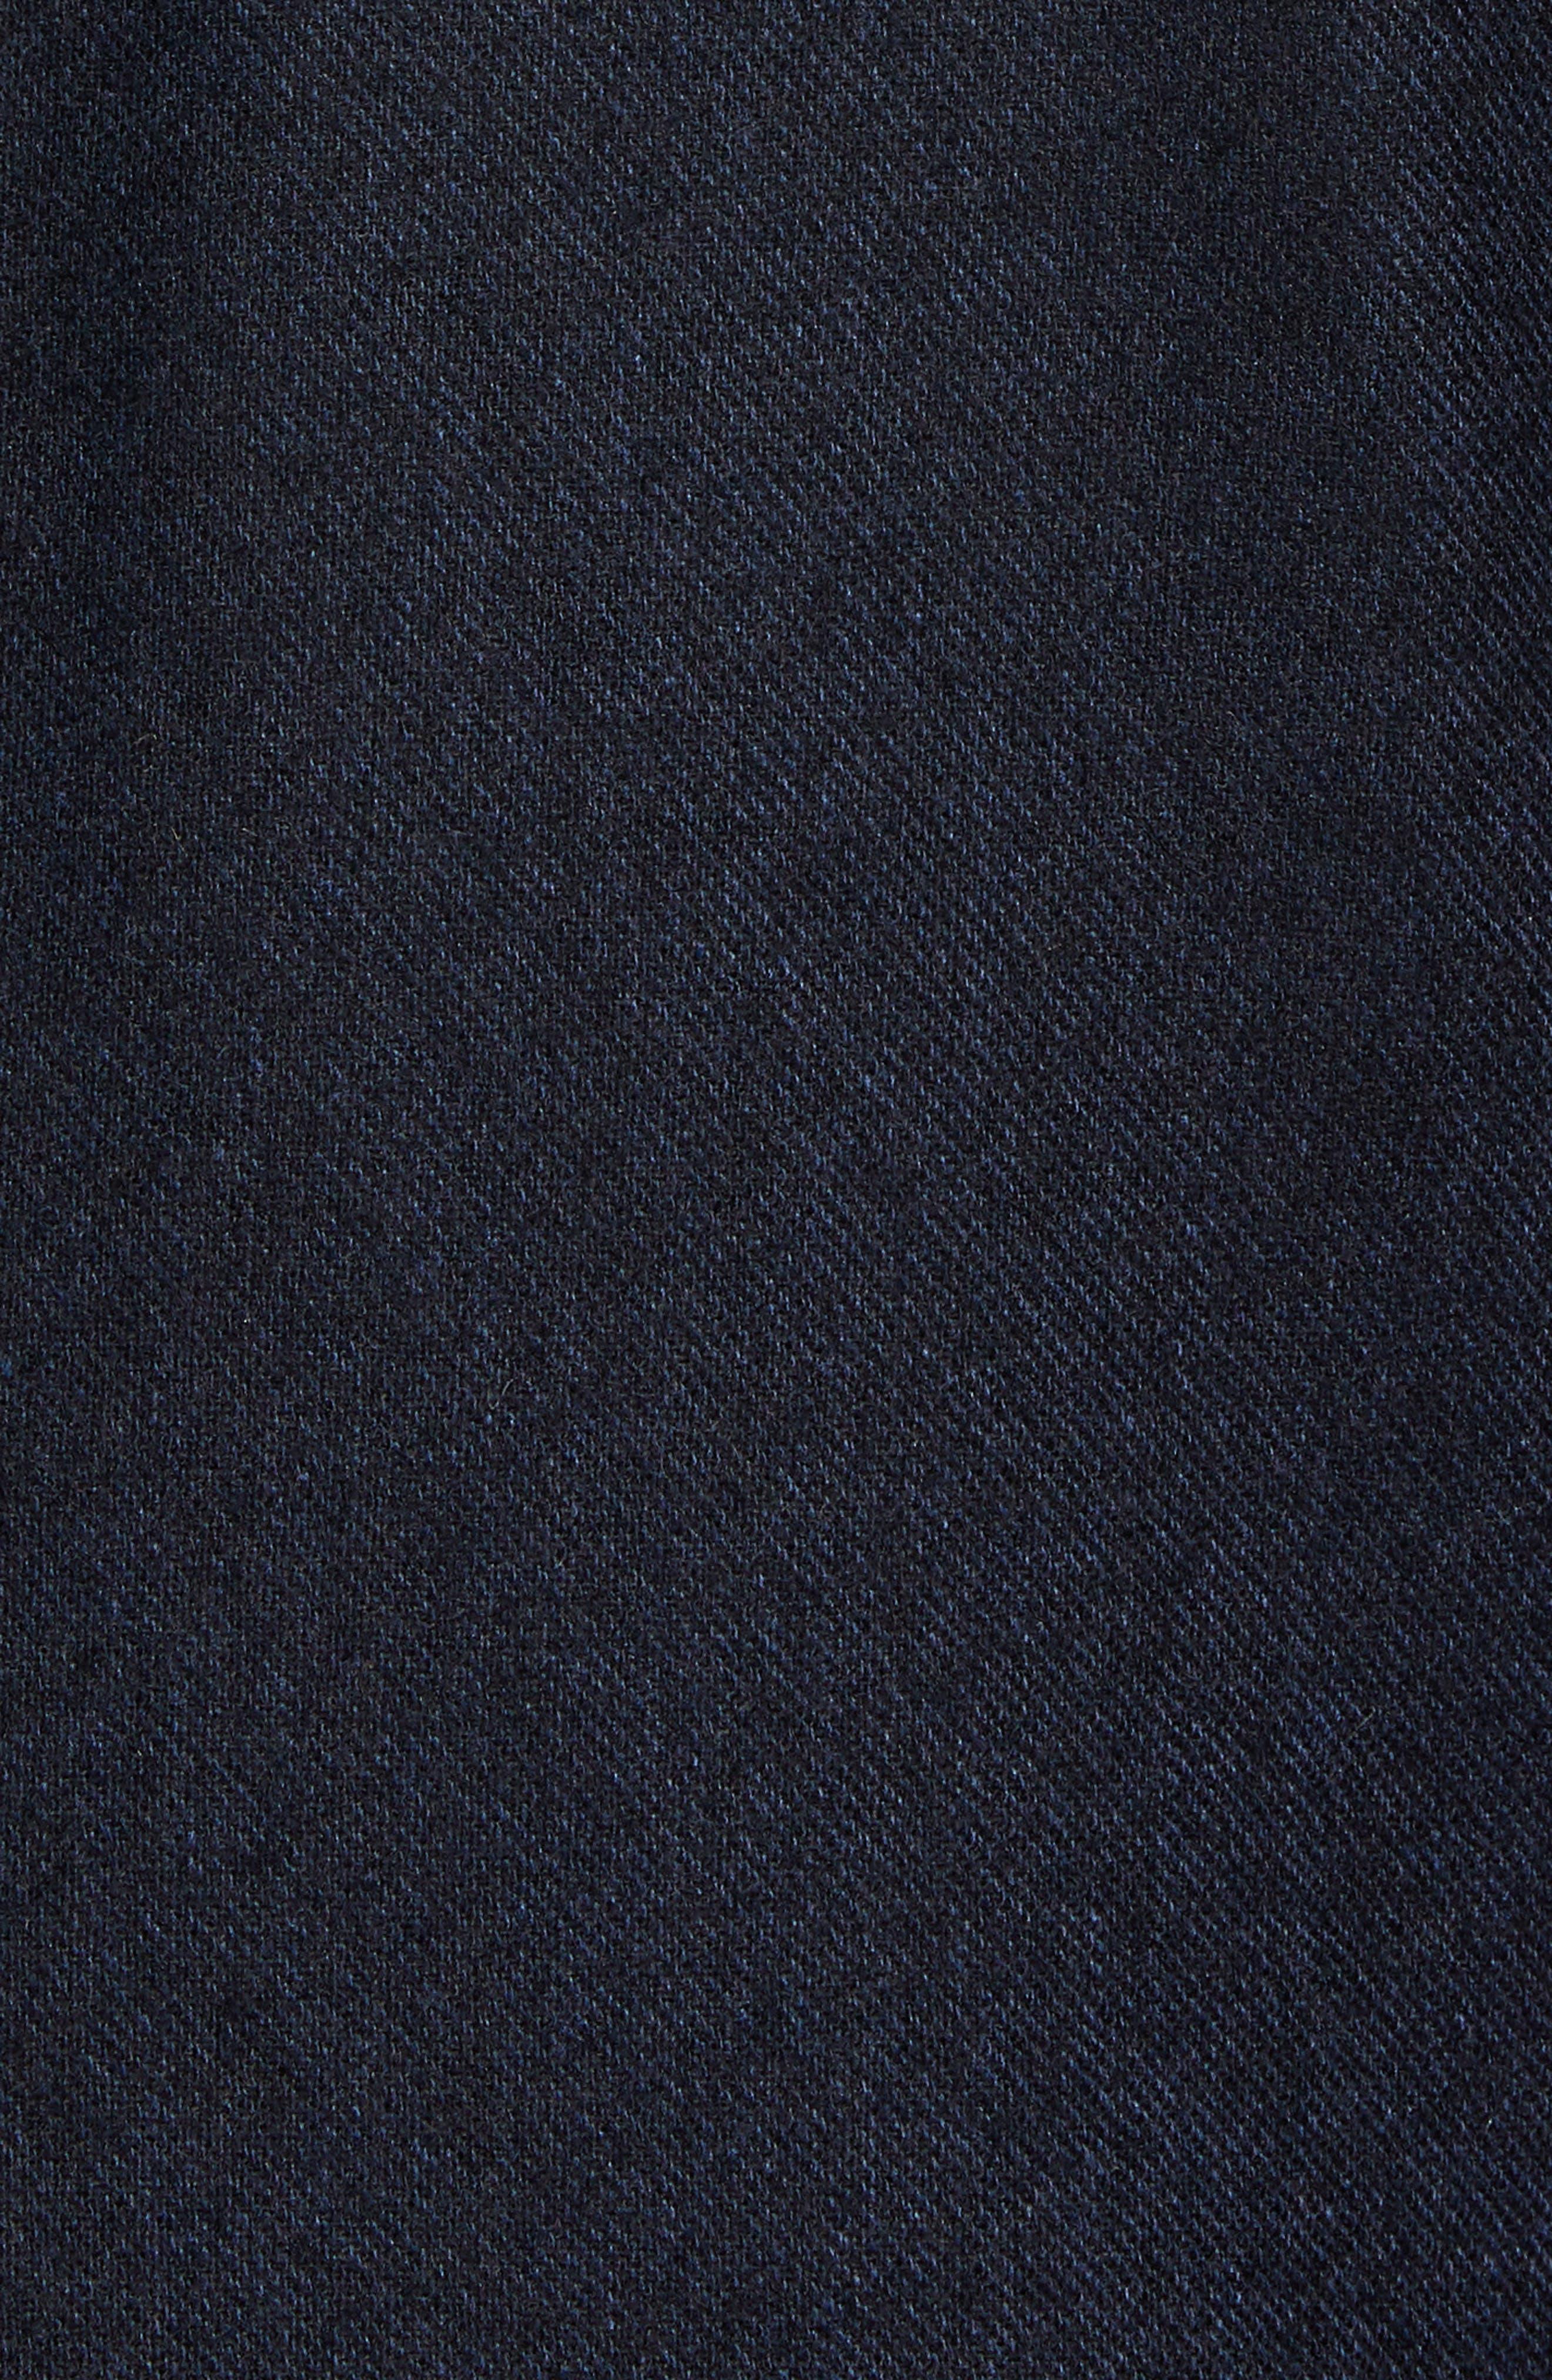 Matza Wool Blend Sport Coat,                             Alternate thumbnail 6, color,                             NAVY